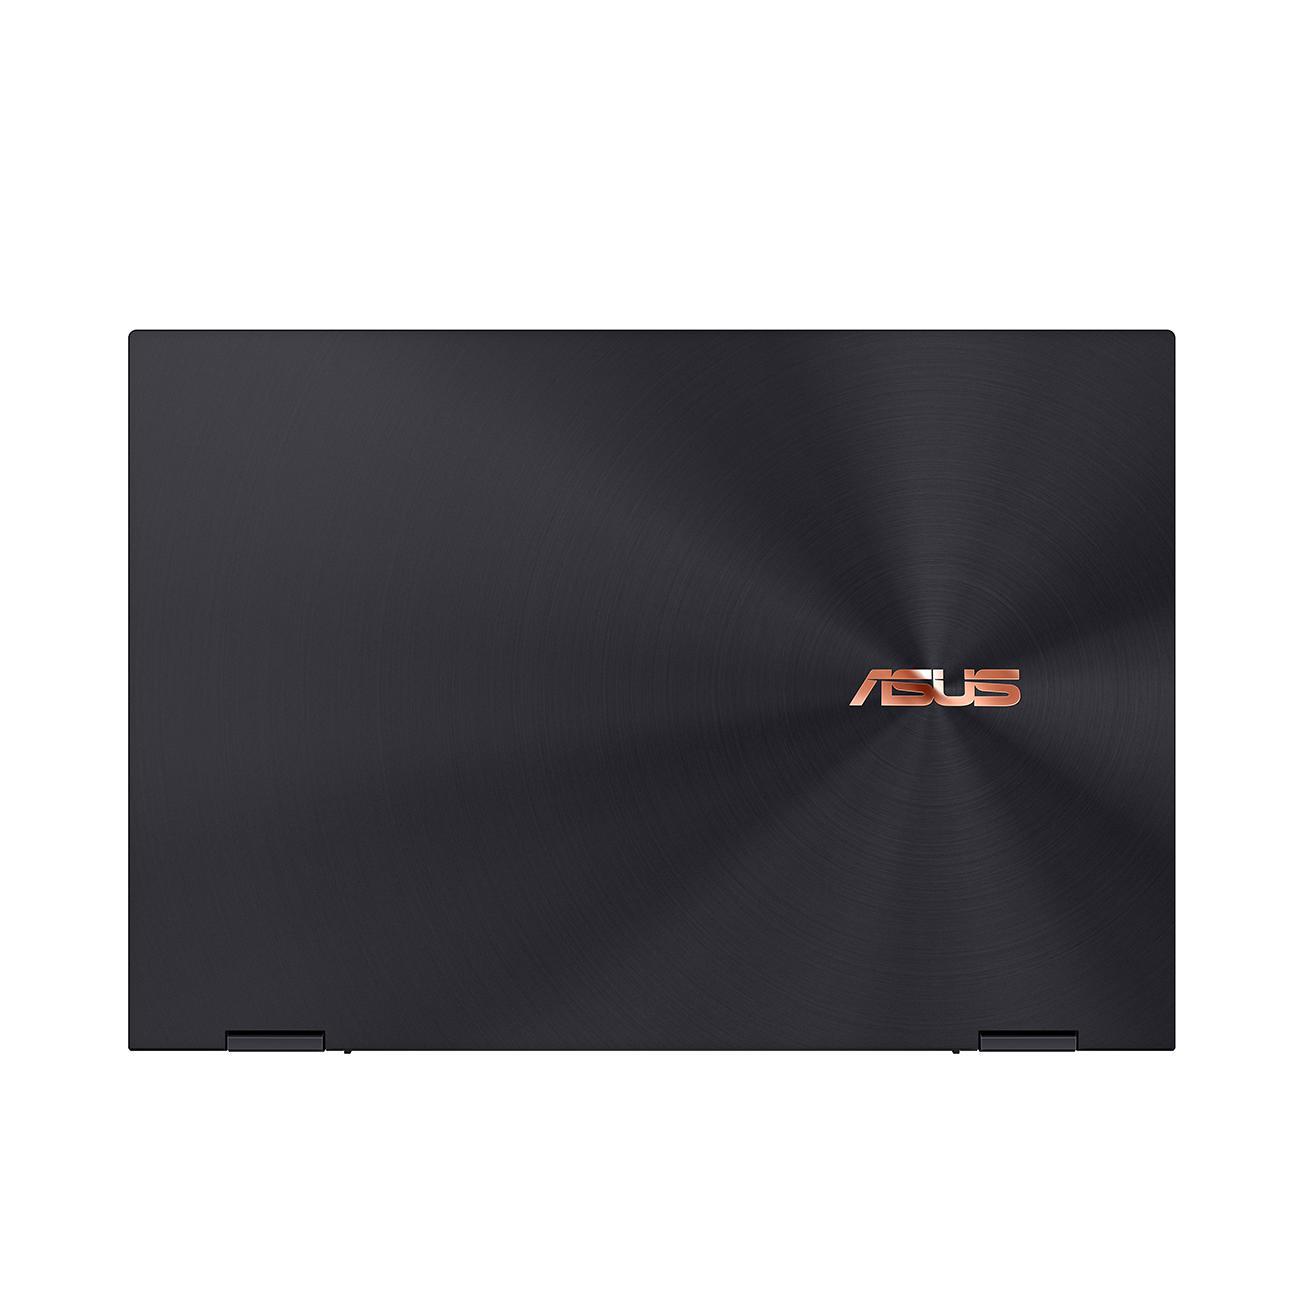 ZenBook Flip S_UX371_Product photo_2K_Jade Black_11.jpg